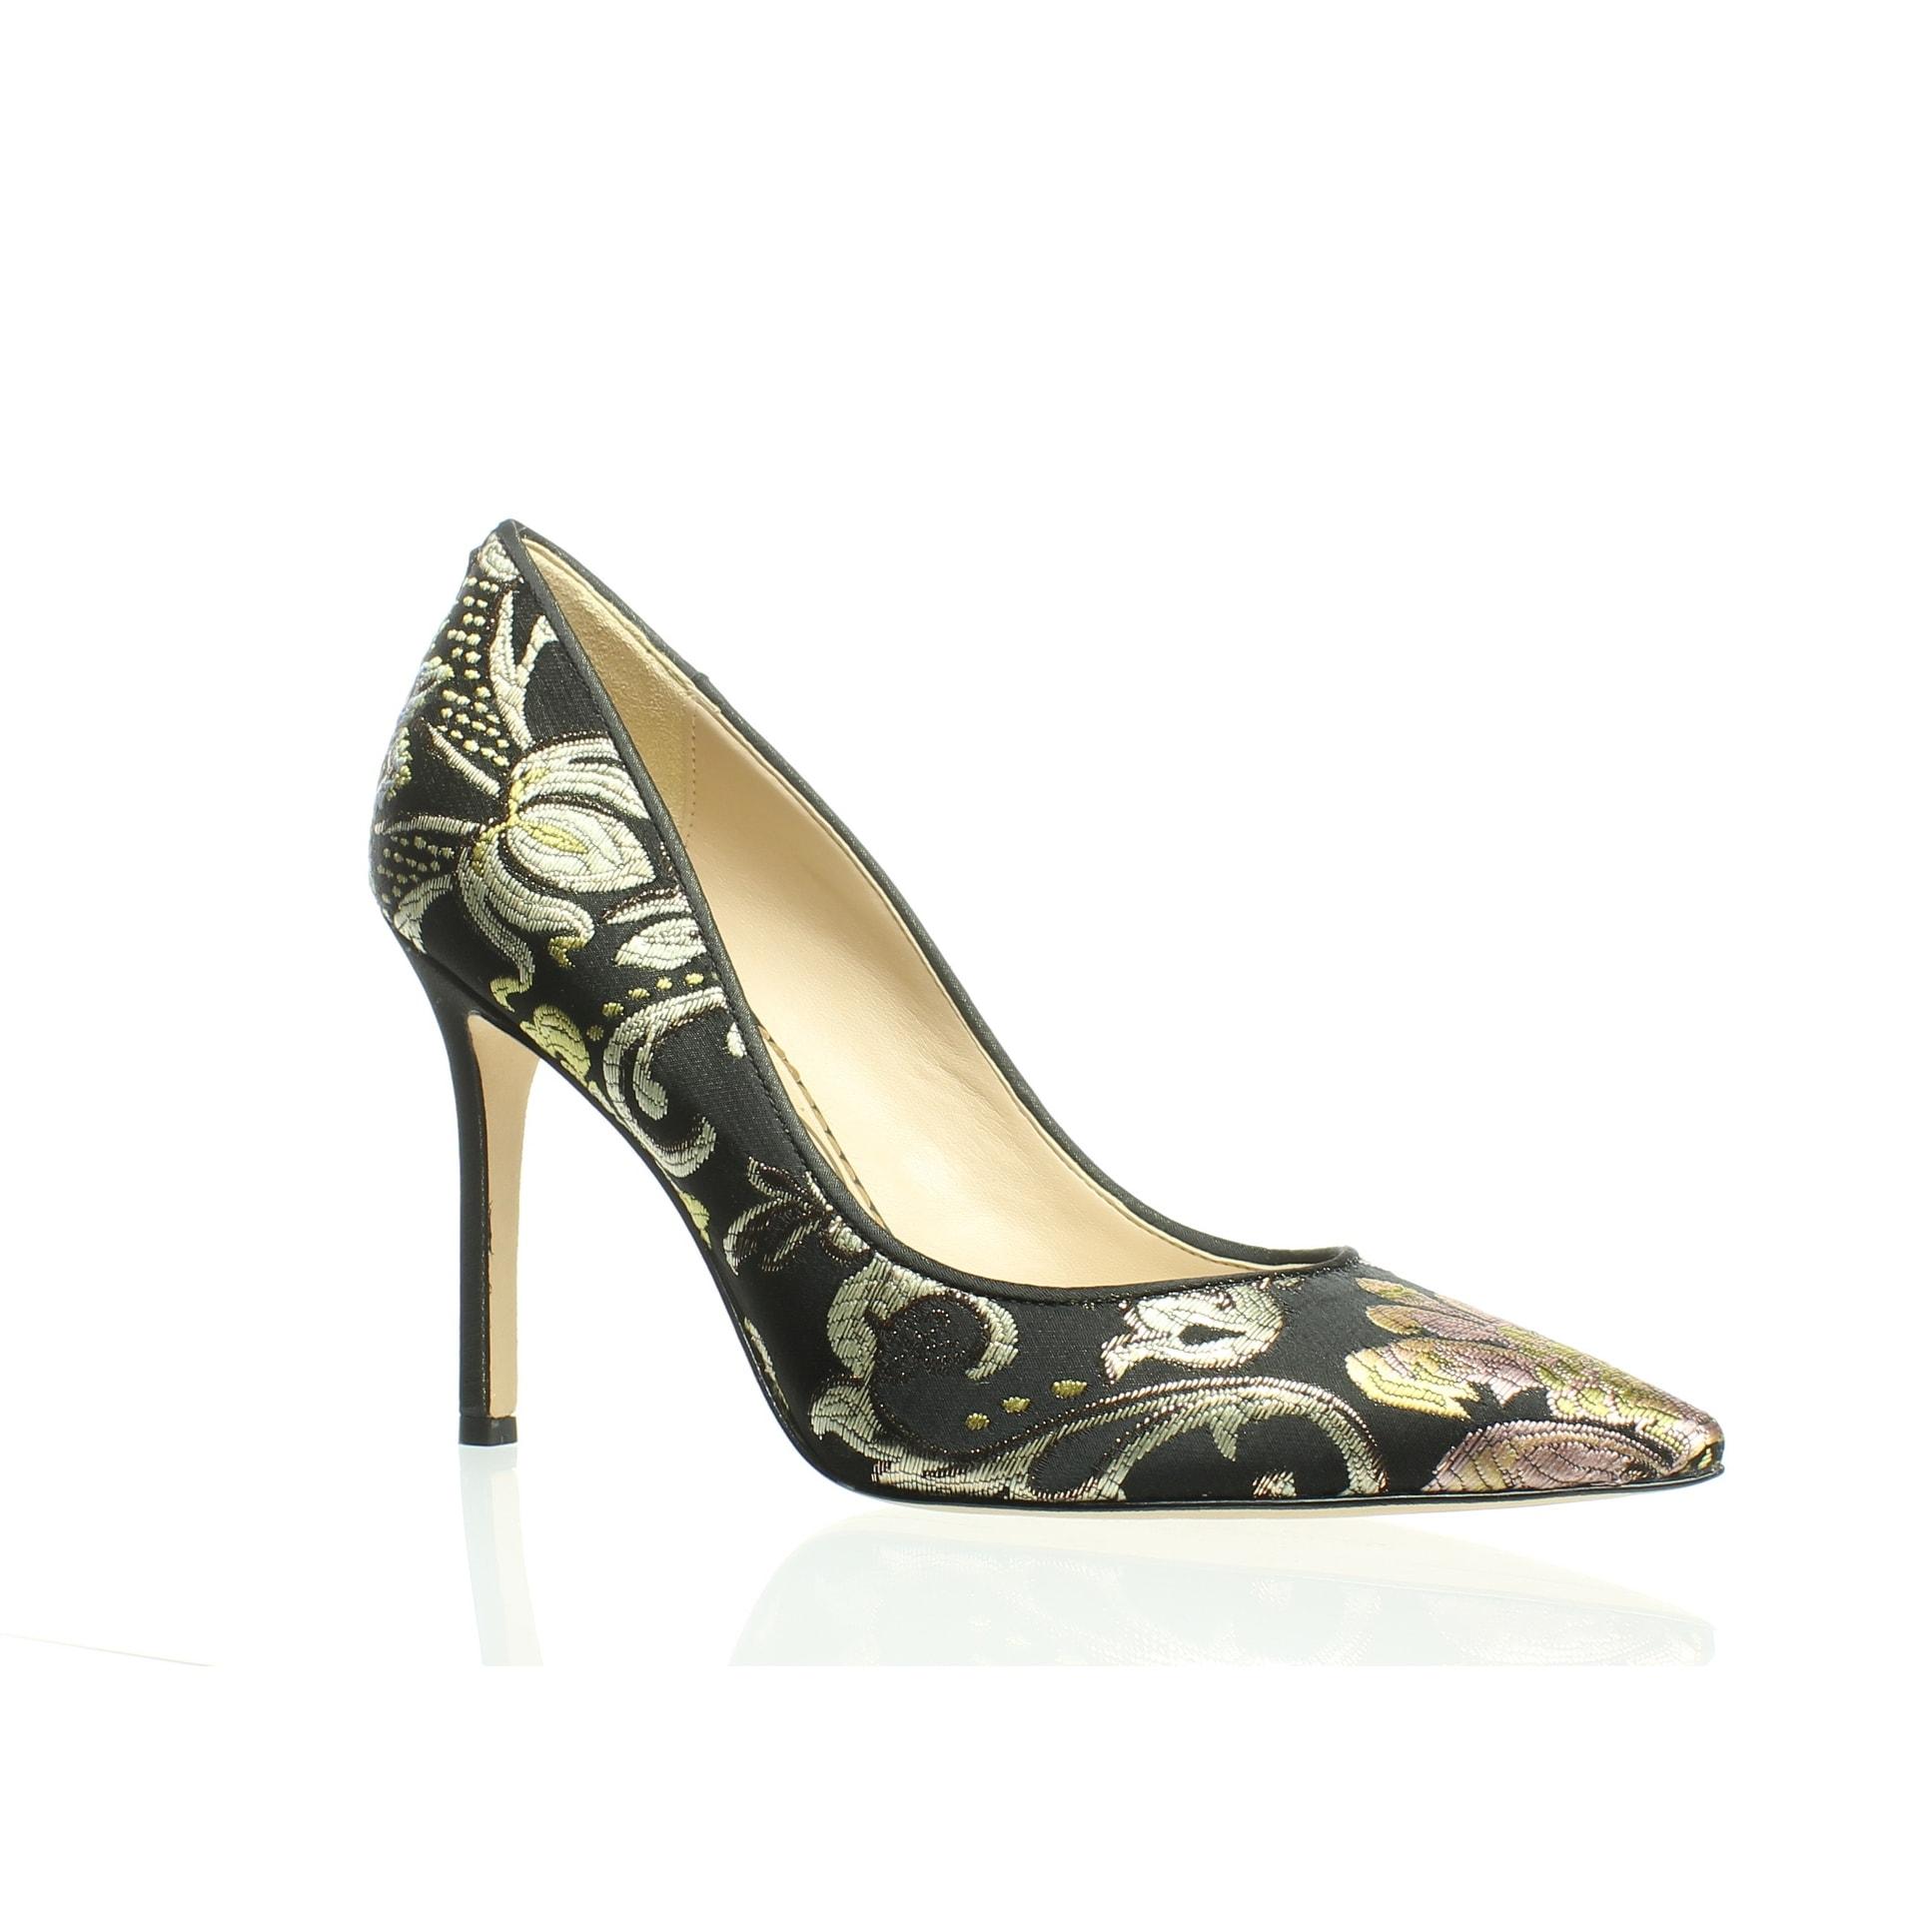 1b91d5d4b3 Shop Sam Edelman Womens Hazel Black/Gold Pumps Size 7.5 - Free ...